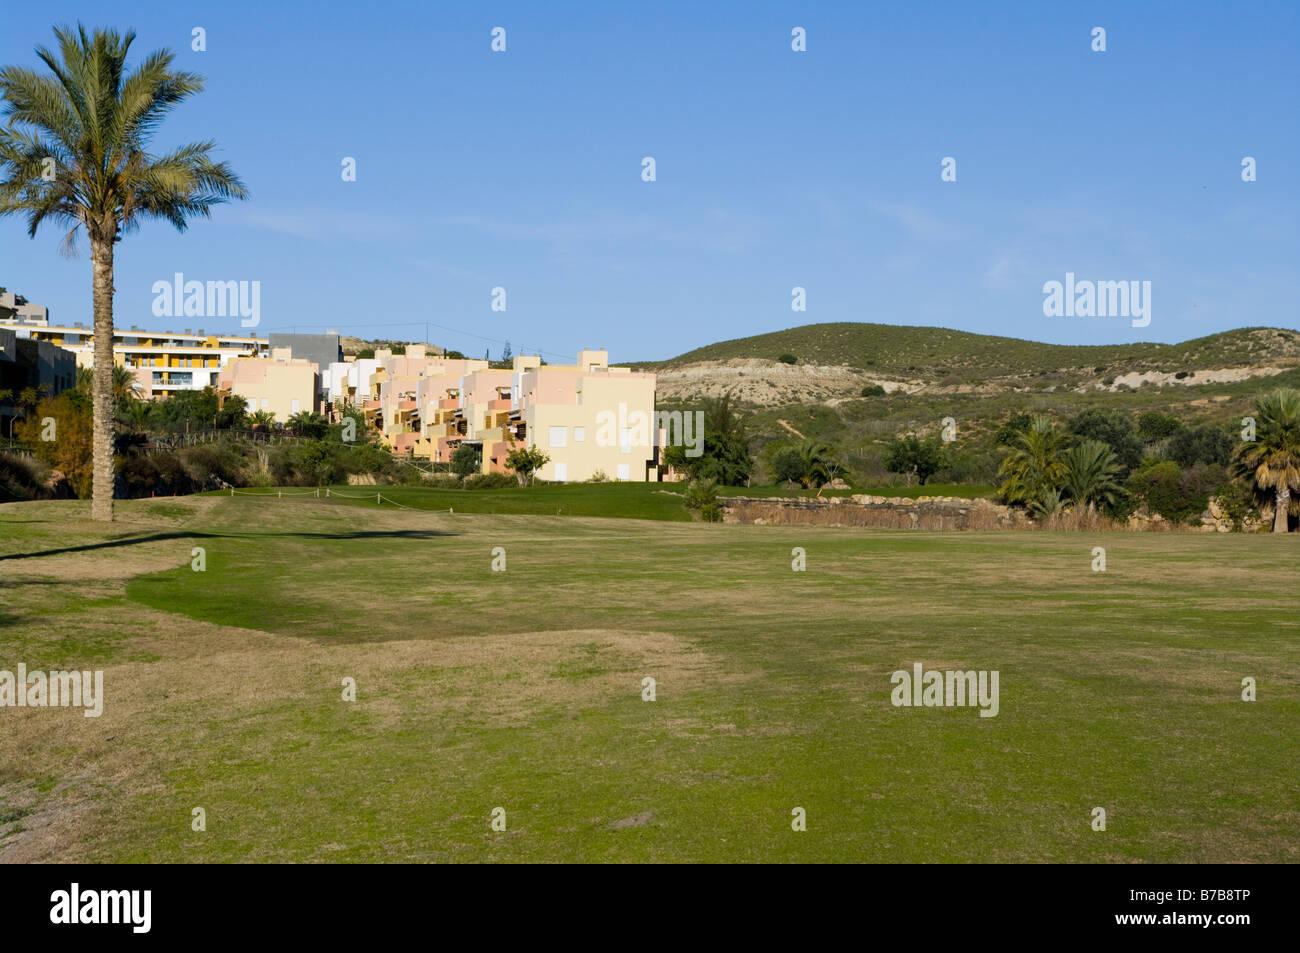 'Par 4' '3rd Hole' Valle Del Este Golf Course Resort Vera Almeria Spain Spanish Golf Courses - Stock Image